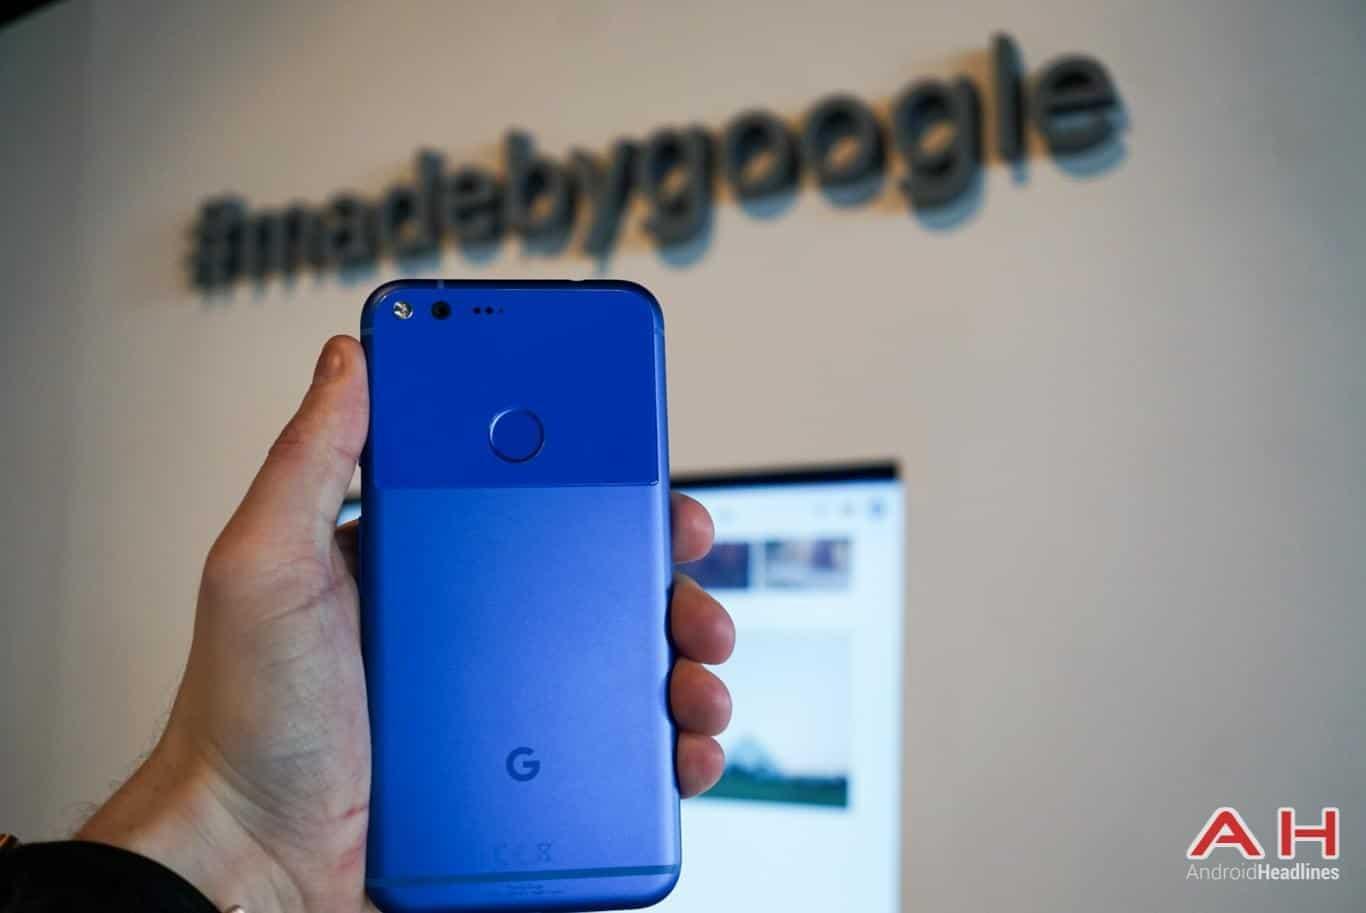 google-pixel-xl-hands-on-ah-16